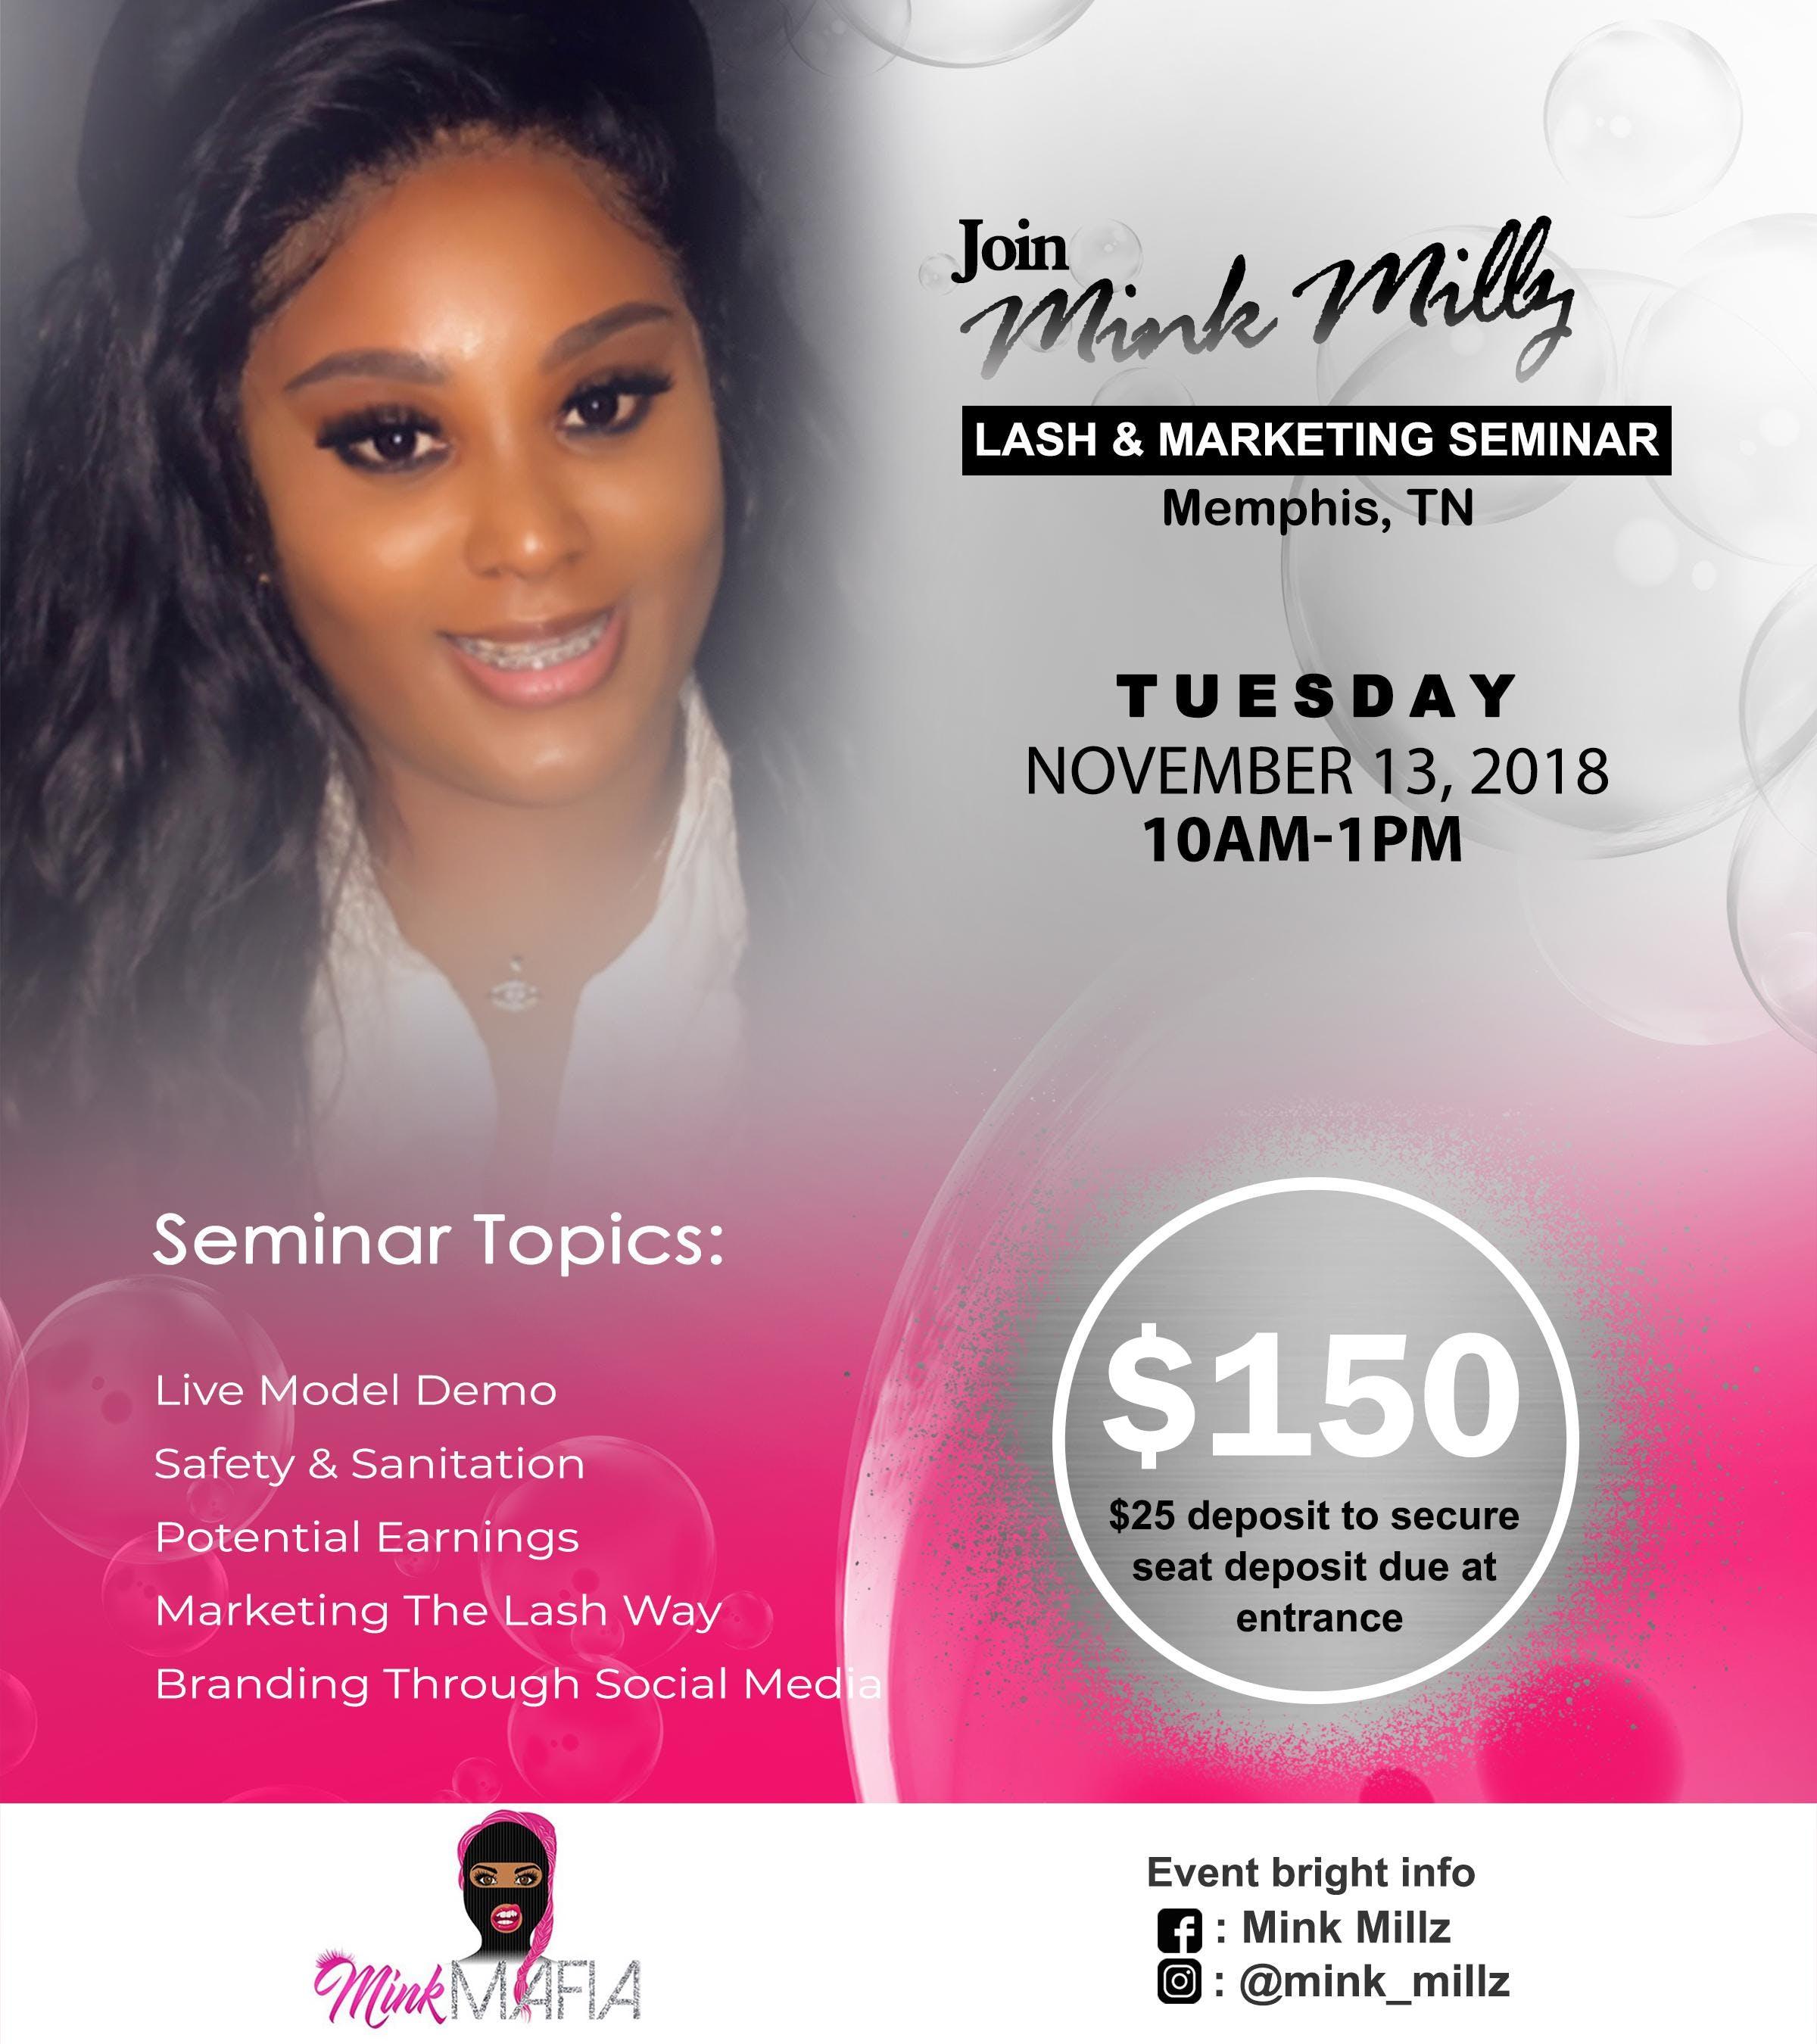 Mink Millz Lash & Marketing Seminar